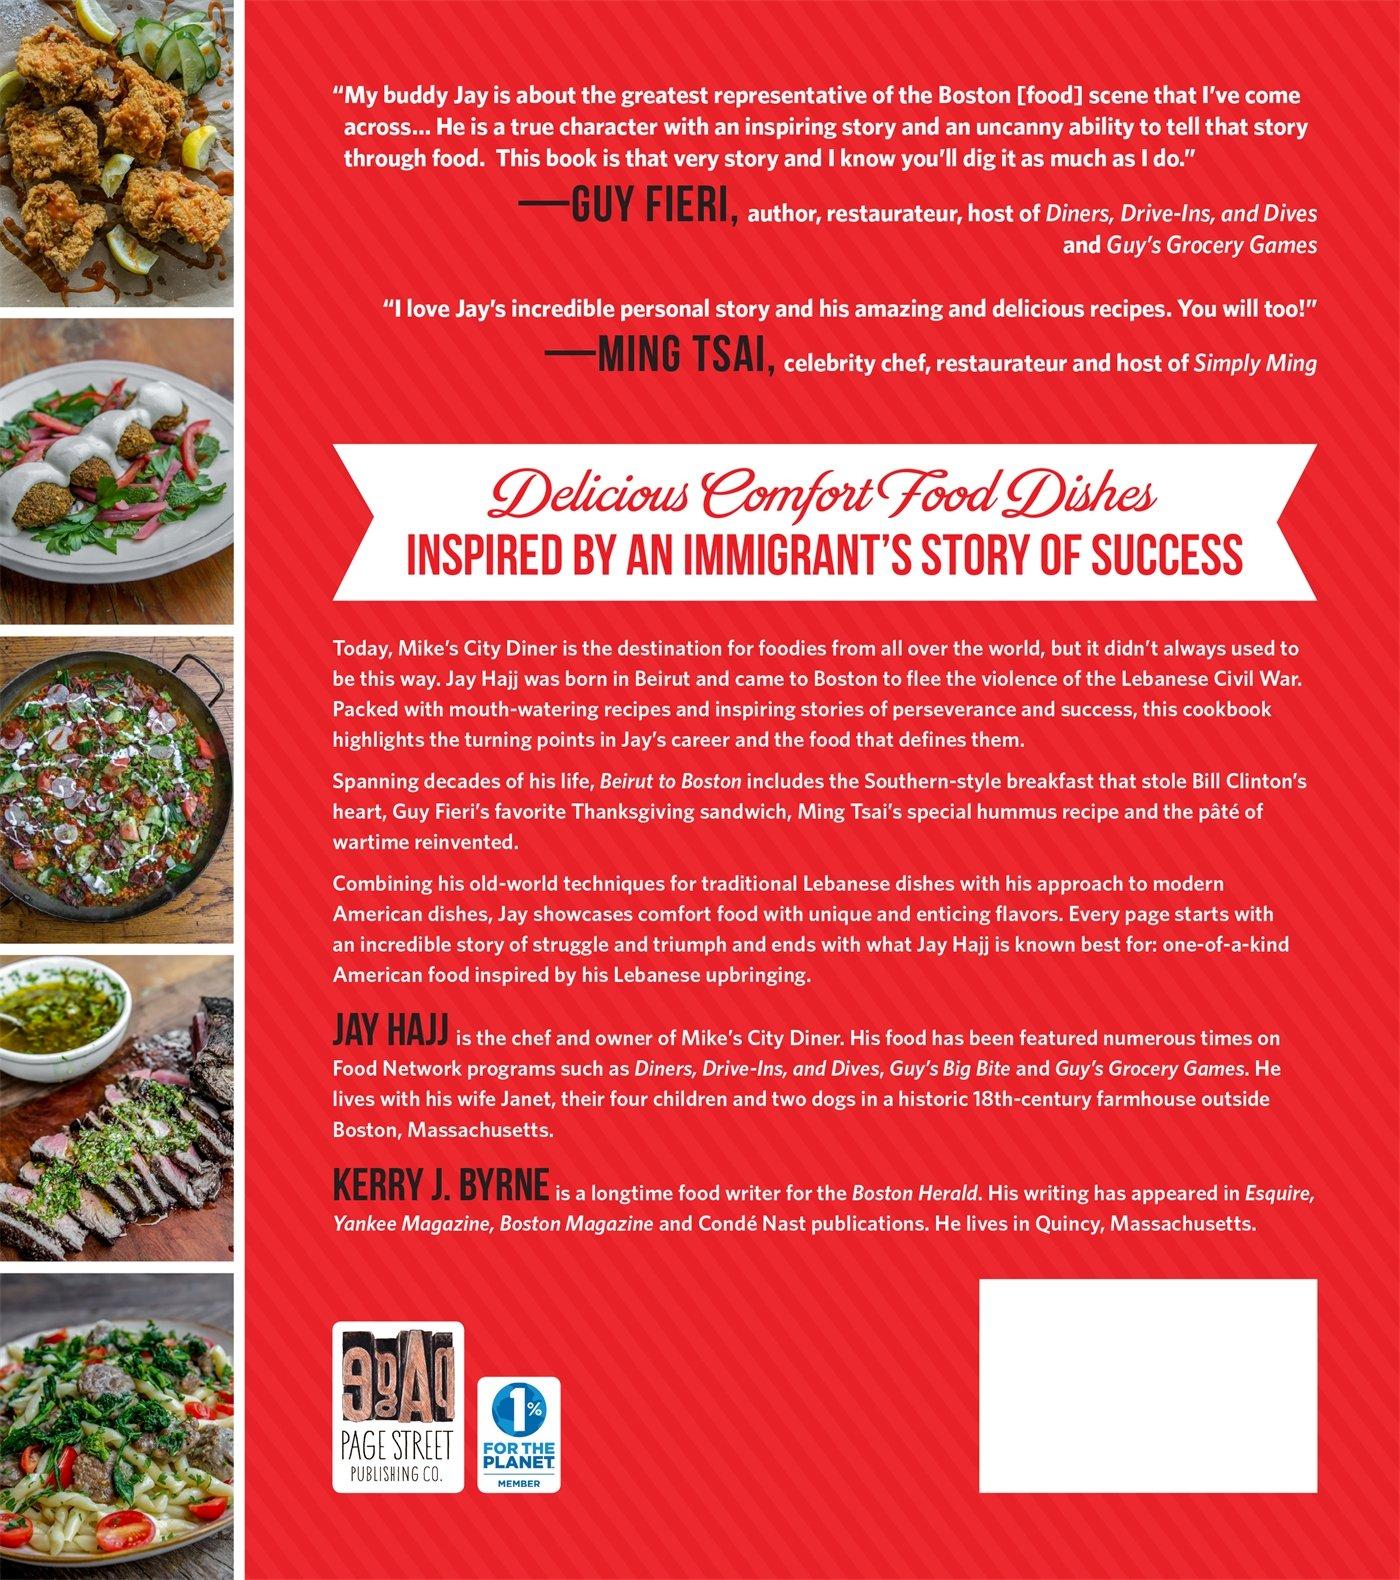 Beirut to boston a cookbook comfort food inspired by a rags to beirut to boston a cookbook comfort food inspired by a rags to restaurants story jay hajj 9781624143427 amazon books forumfinder Gallery